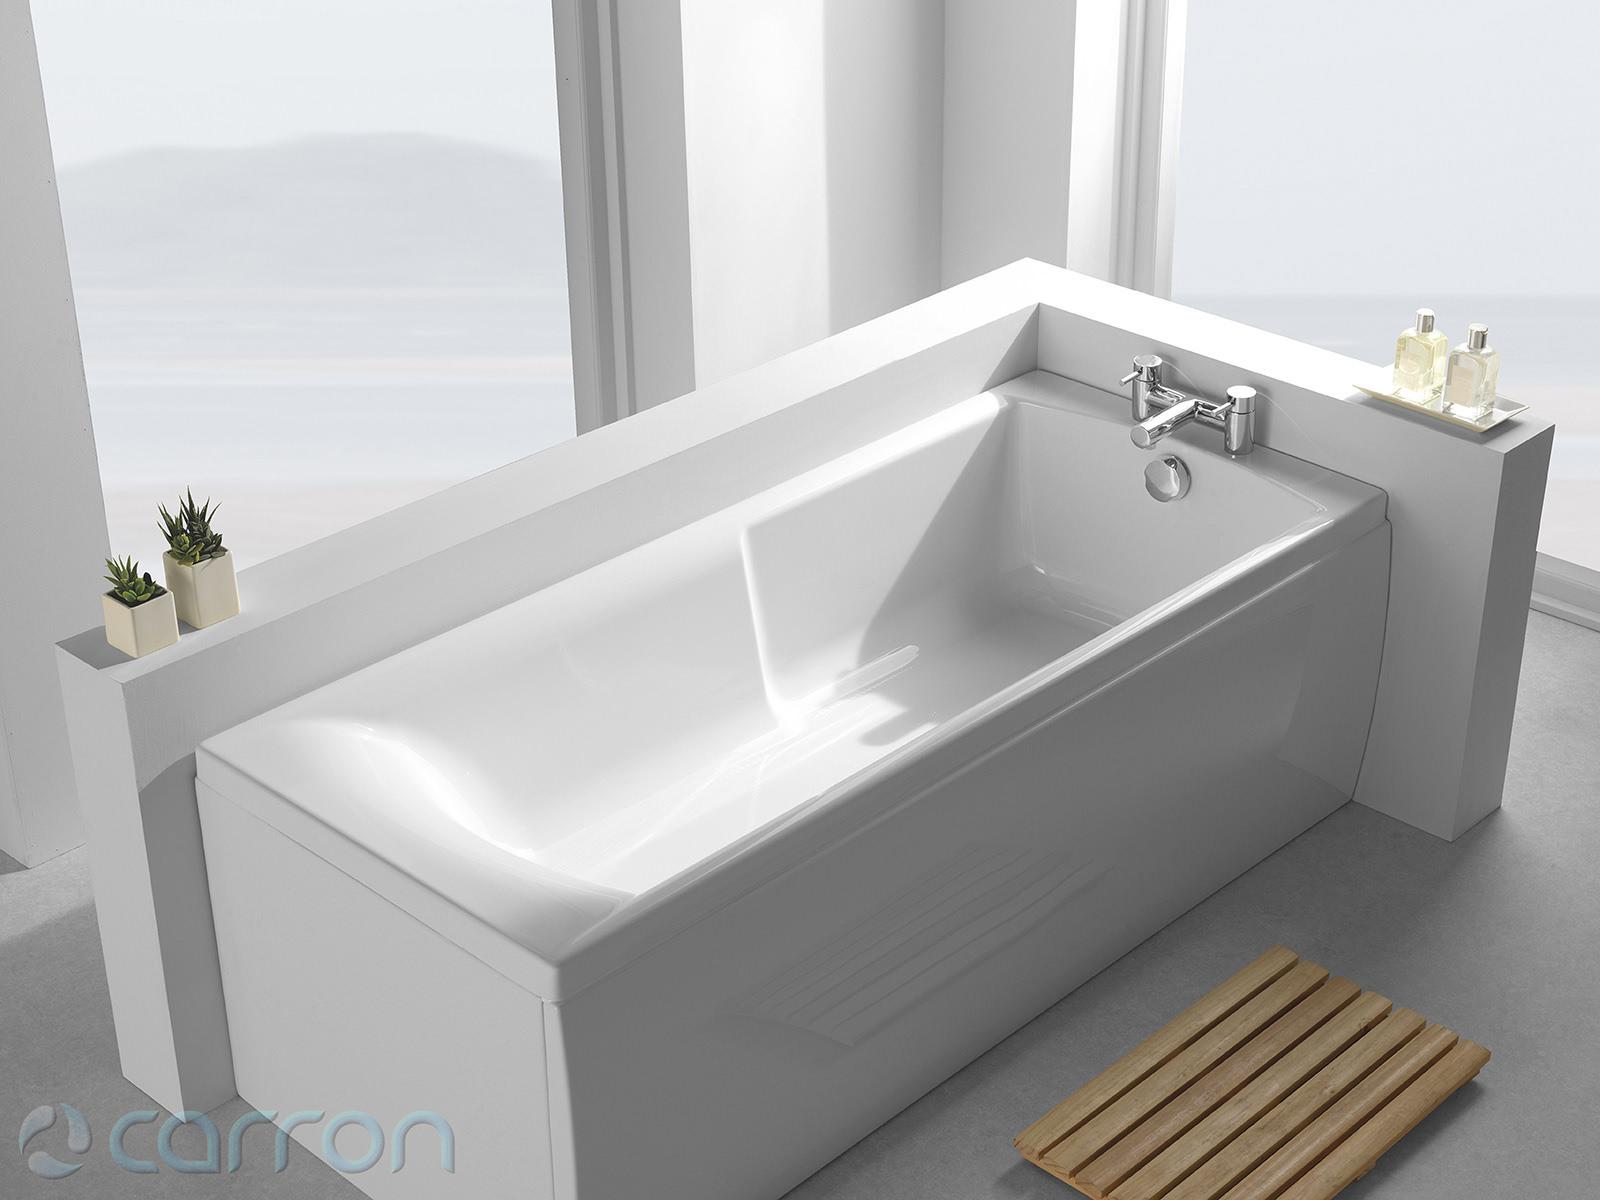 Carron Matrix 5mm Acrylic Single Ended Bath 1500 X 700mm